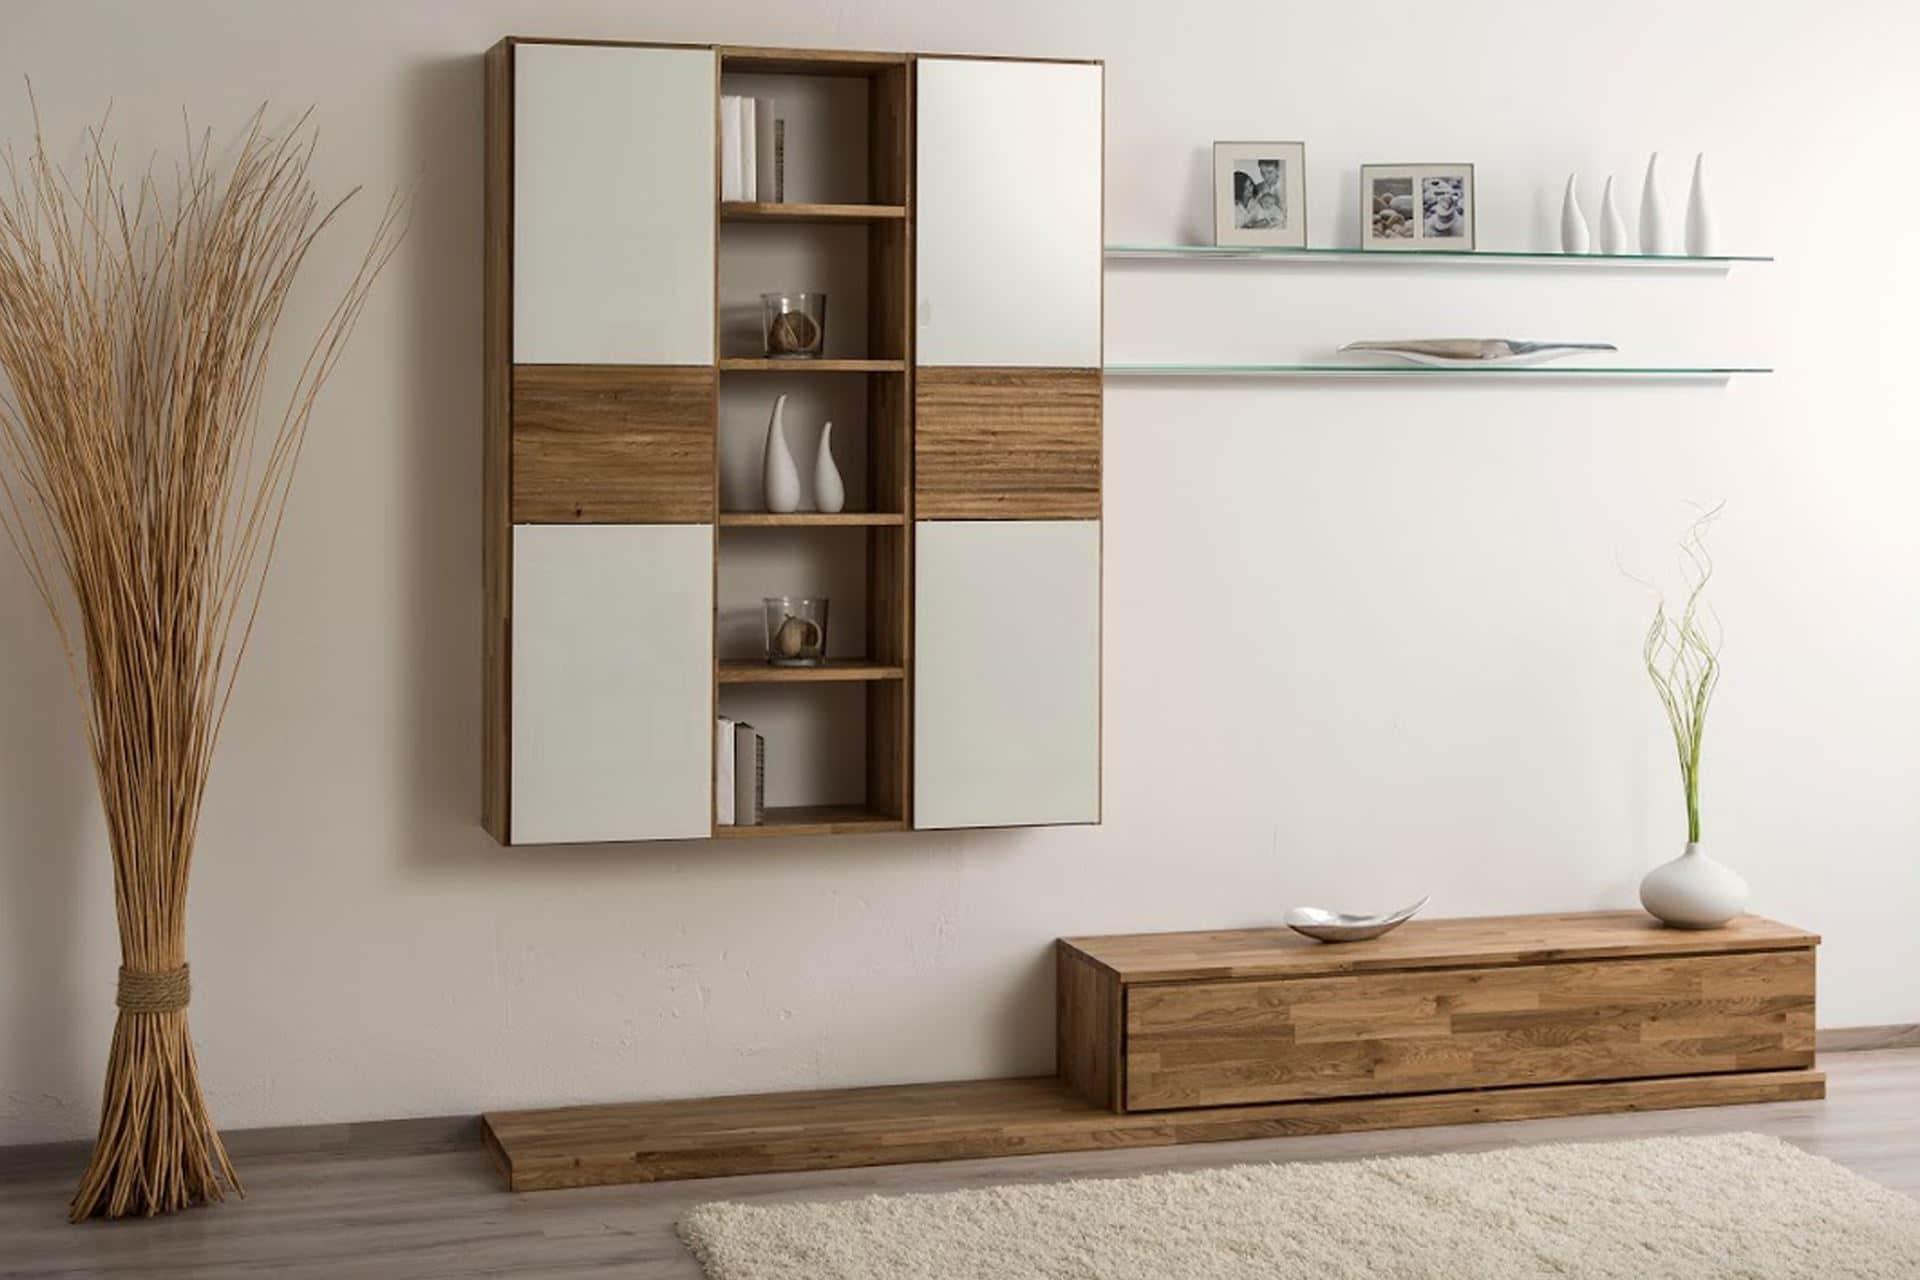 wohnwand trendnatur mit h ngeregalschrank ko control. Black Bedroom Furniture Sets. Home Design Ideas